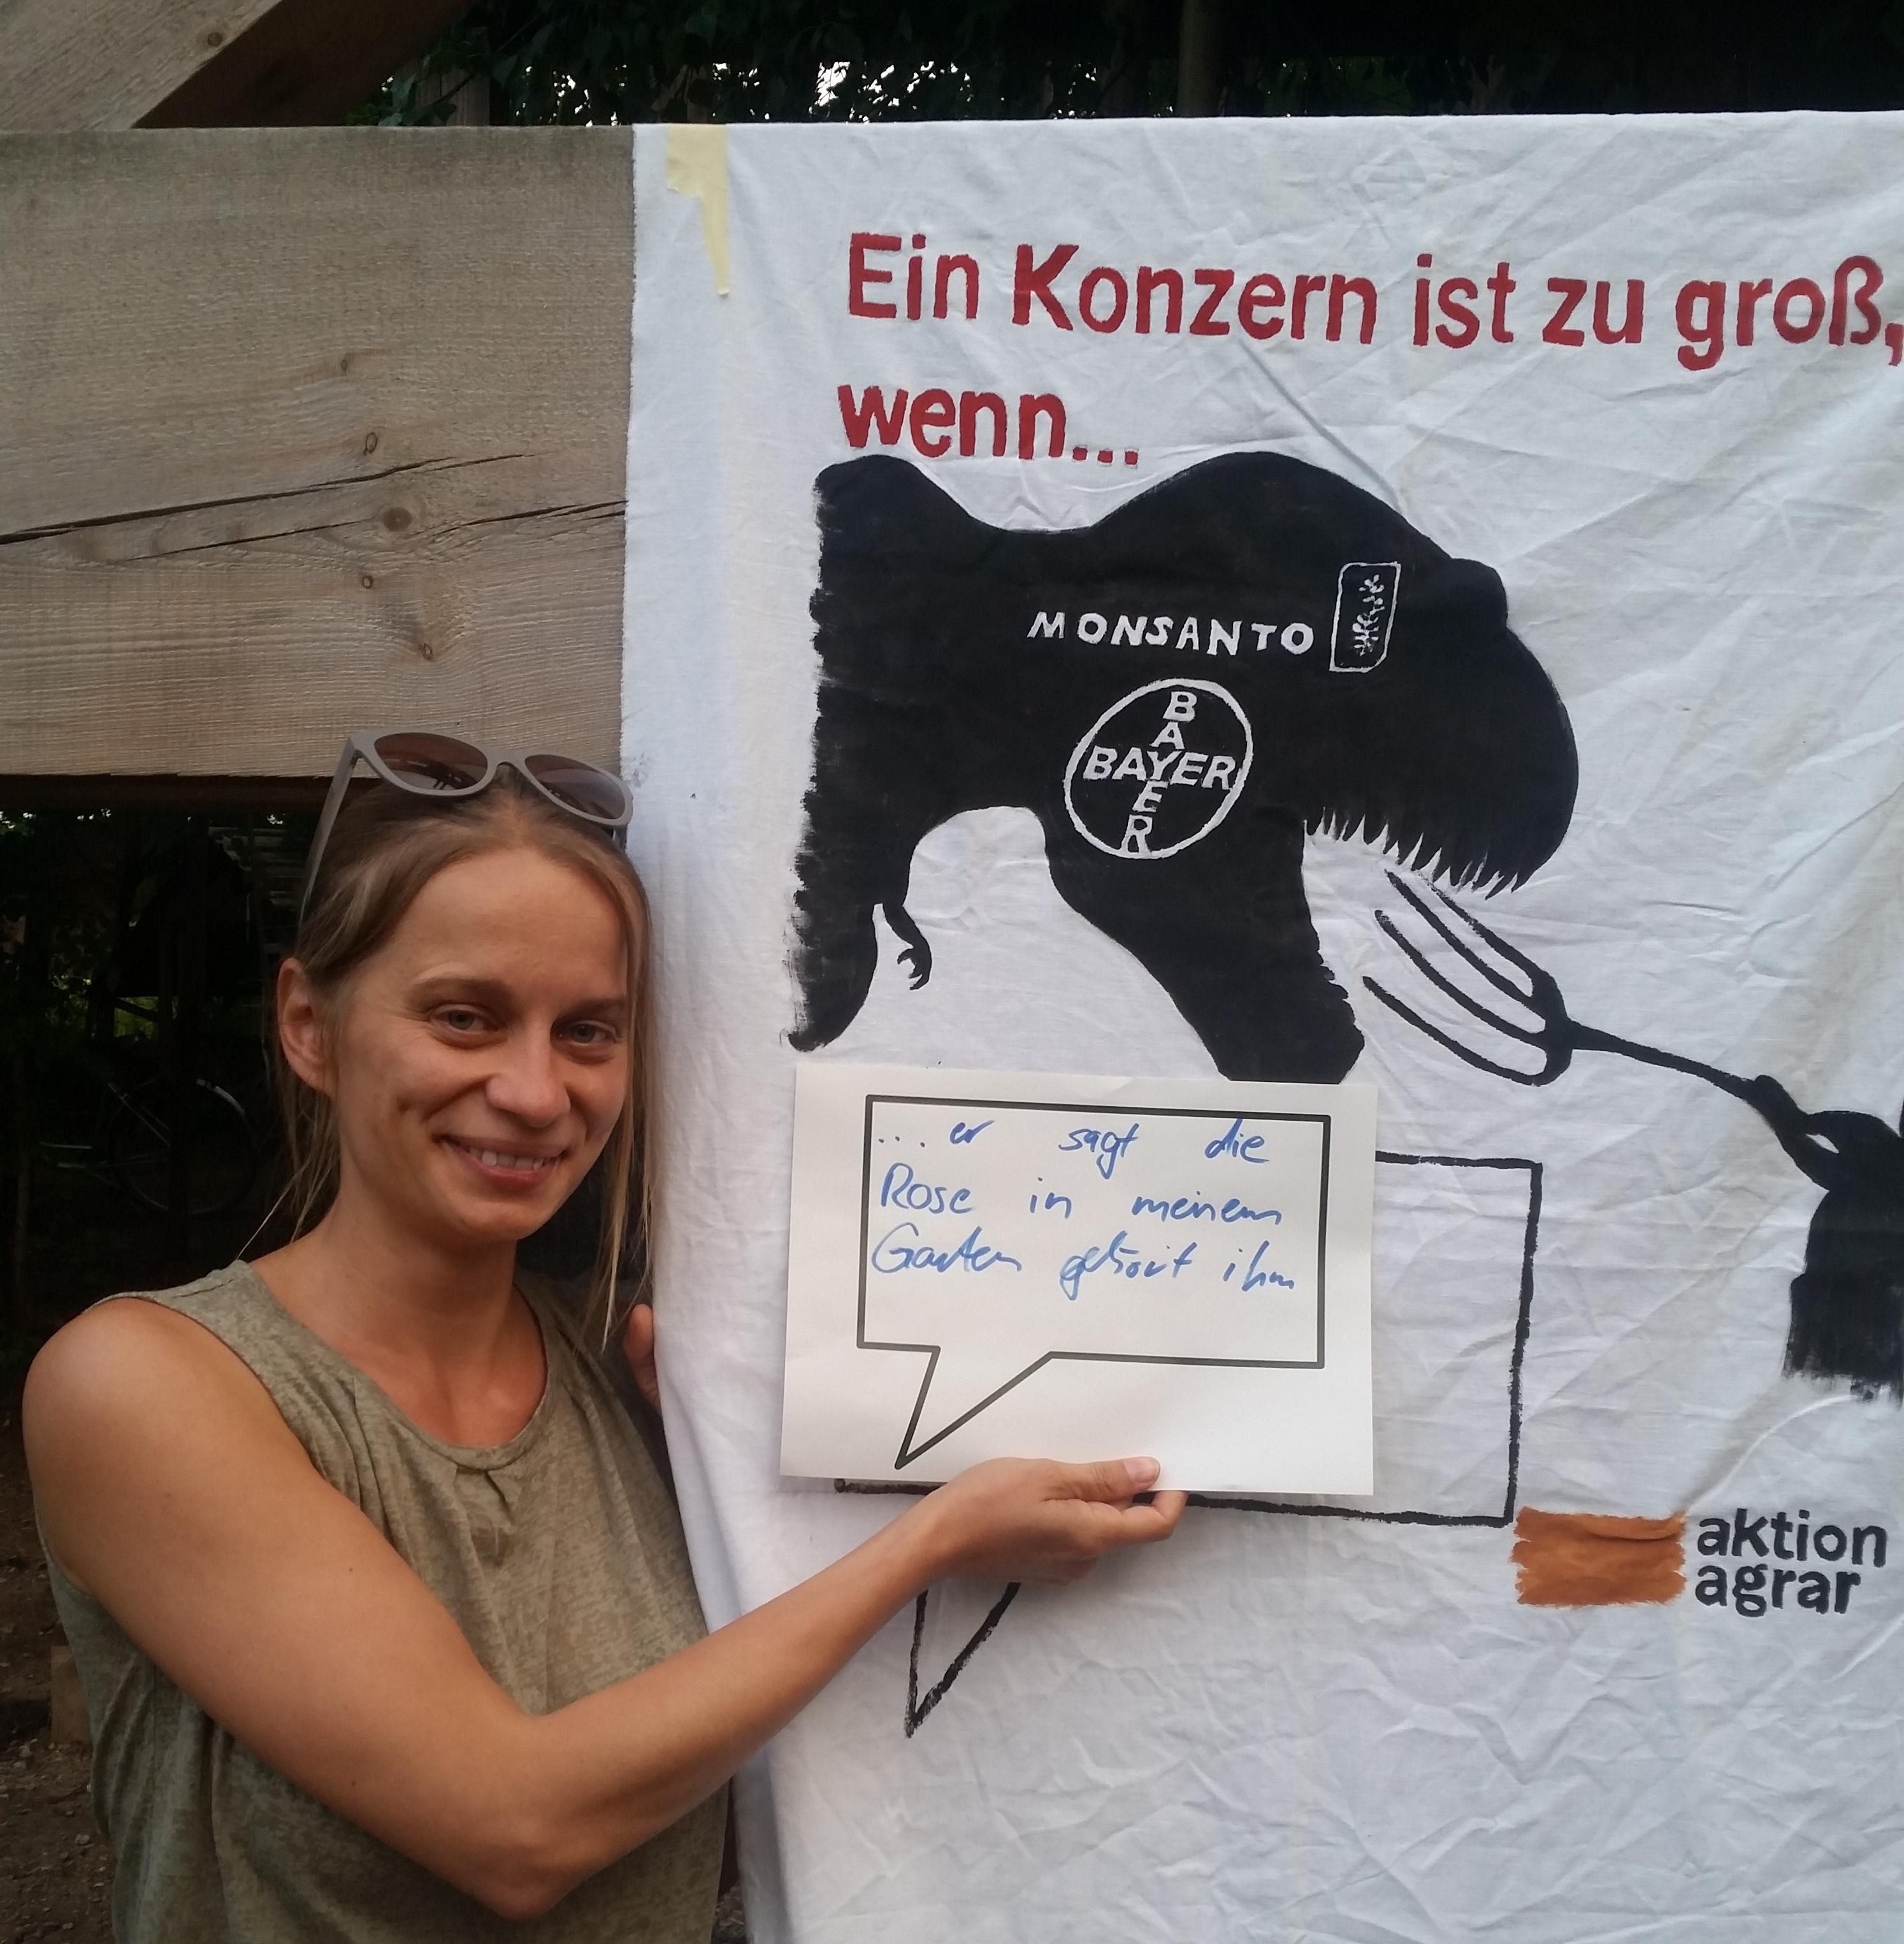 Zitate_Prinzessinnengarten_4